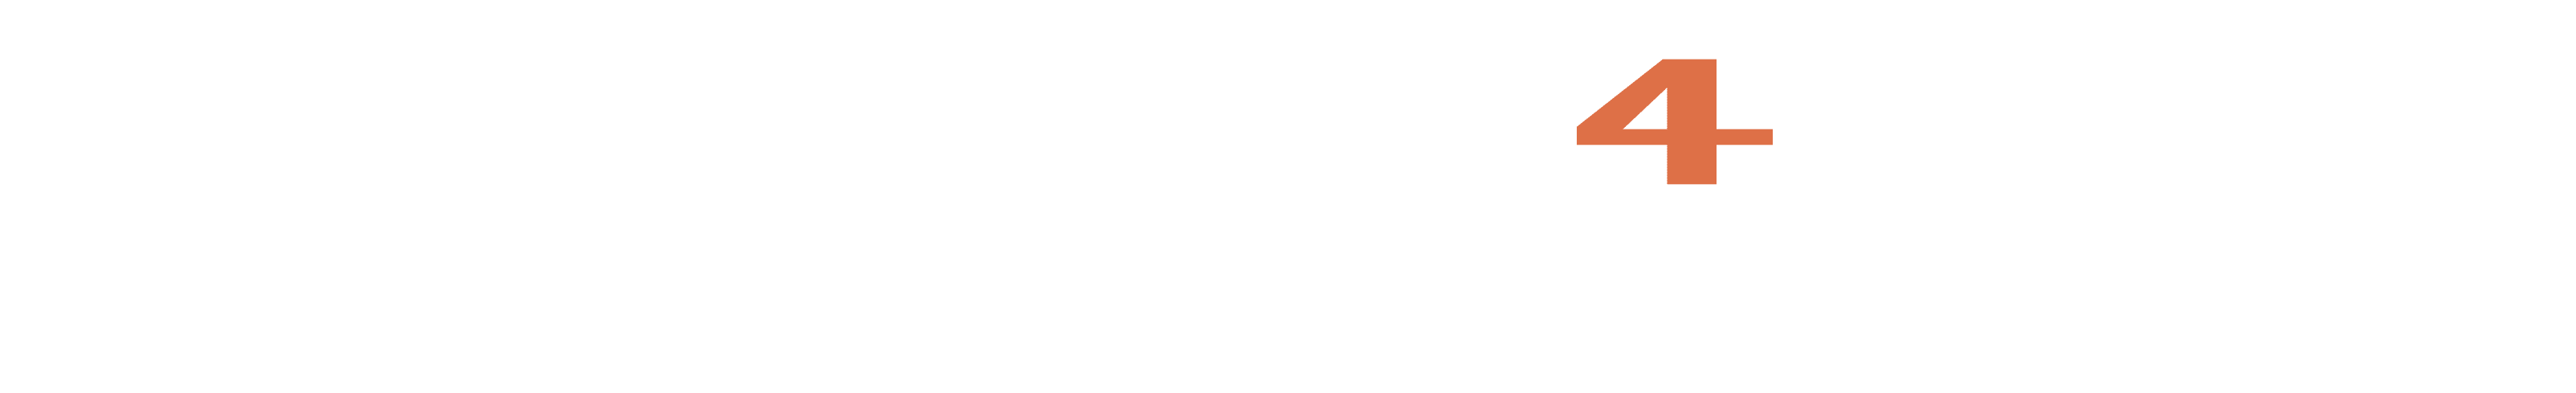 Compliance4Action Horizontal Logo blanc